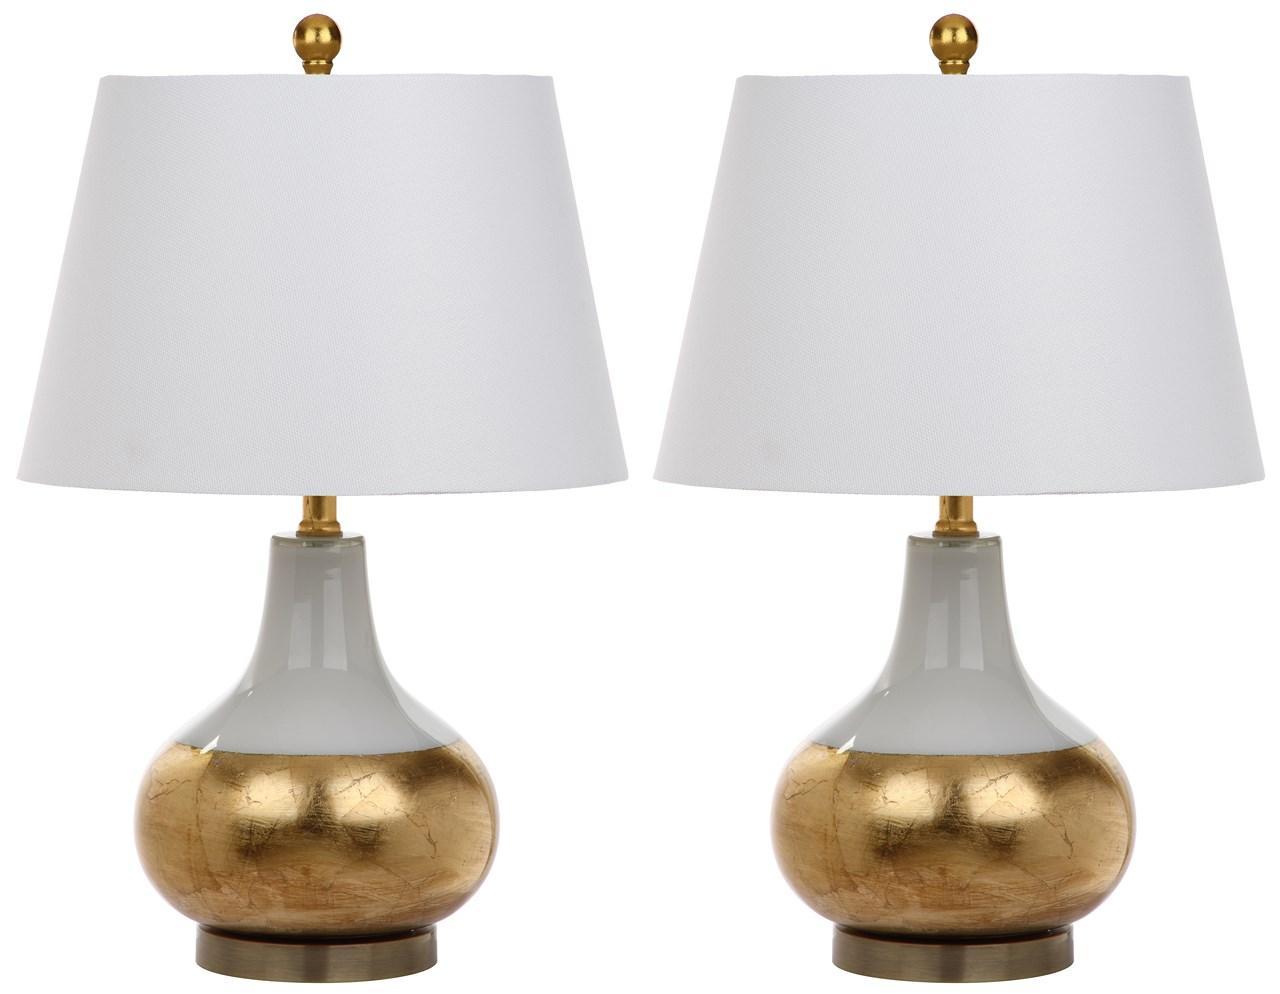 NOVA 23.5 INCH GLASS TABLE LAMP LIT4509A SET2. Lamp Color: White/gold